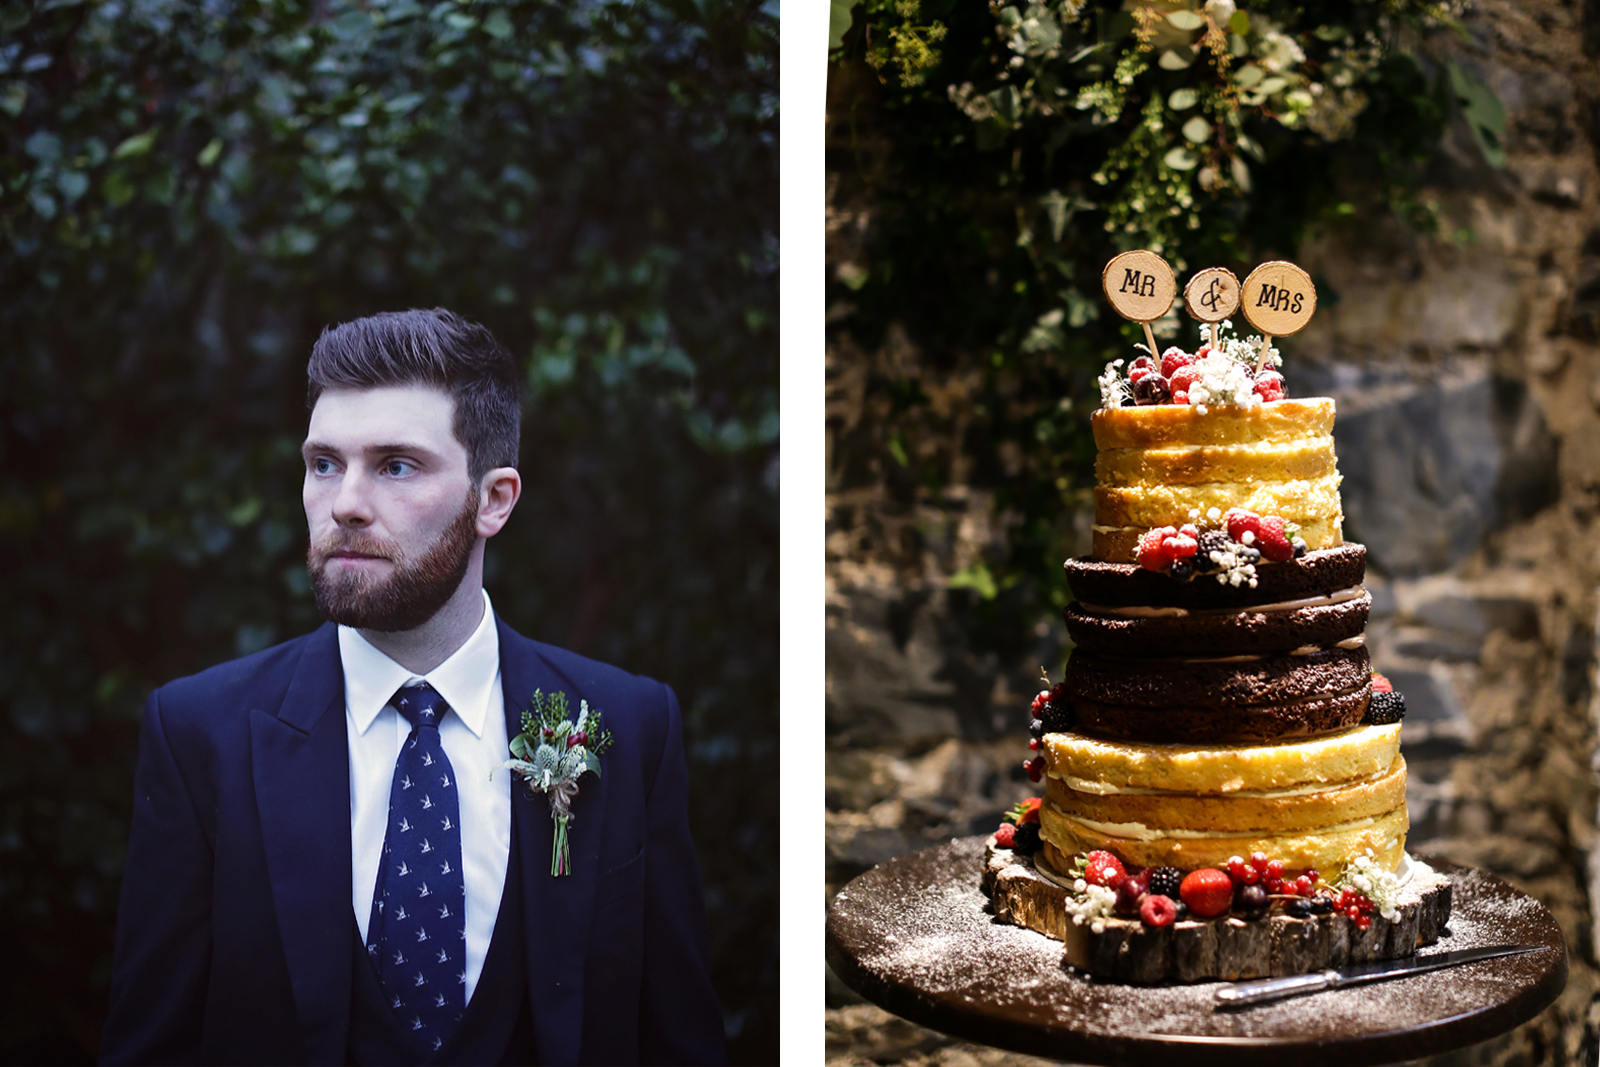 portrait-cake.jpg